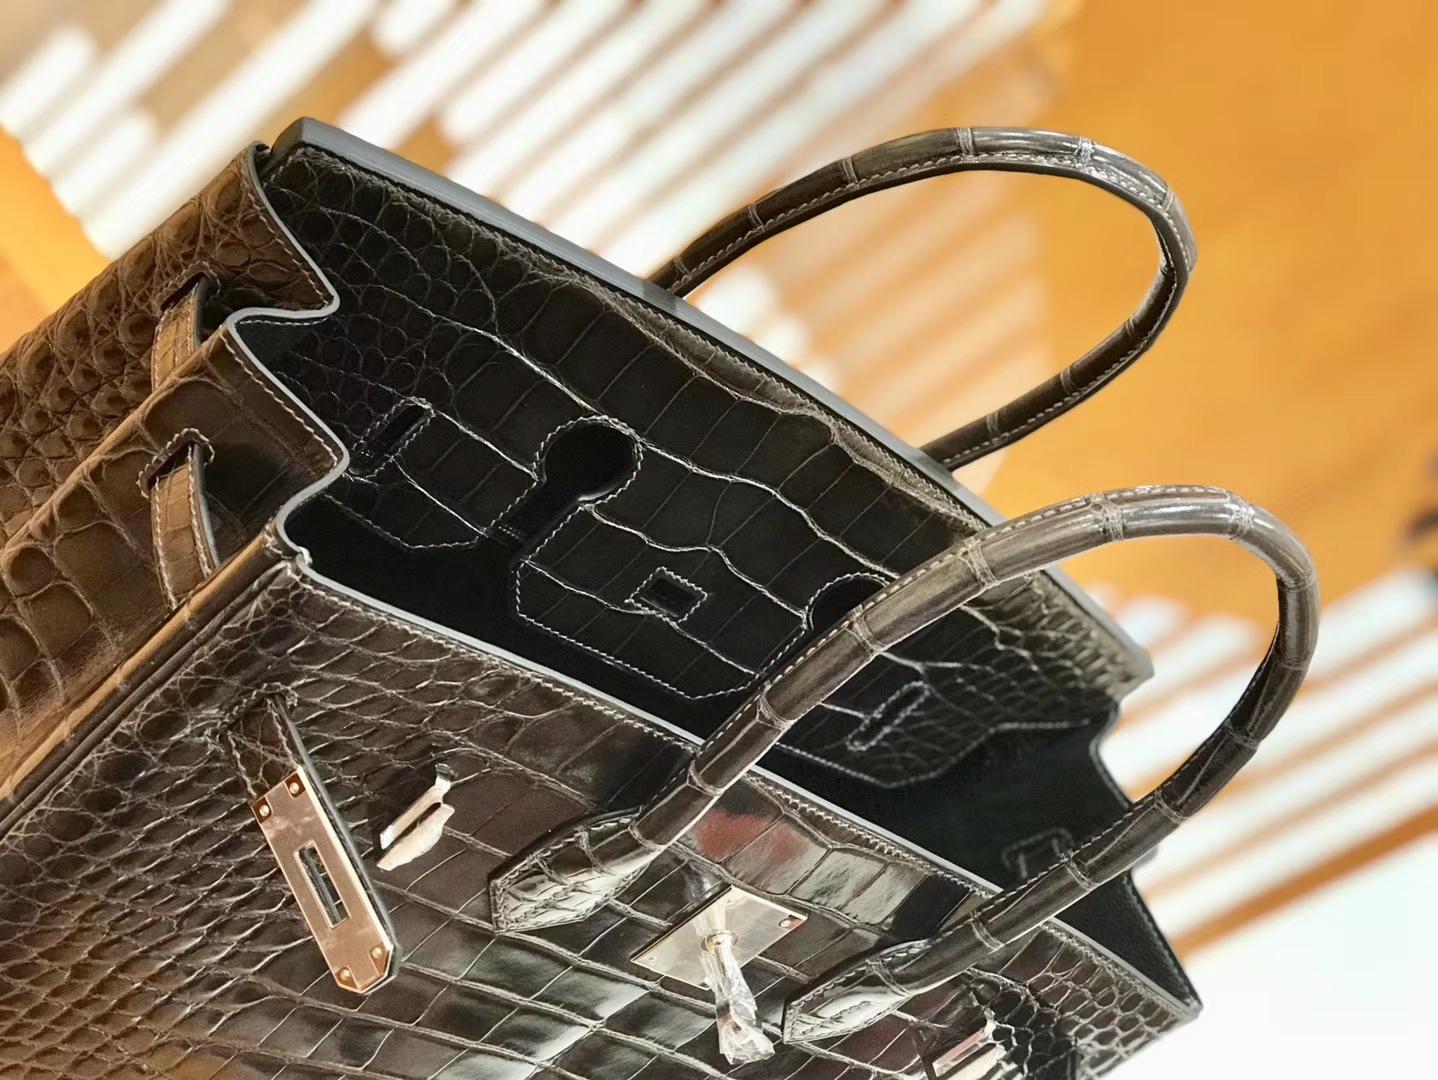 Hermès(爱马仕)Birkin 35cm 美洲鳄鱼 锡器灰